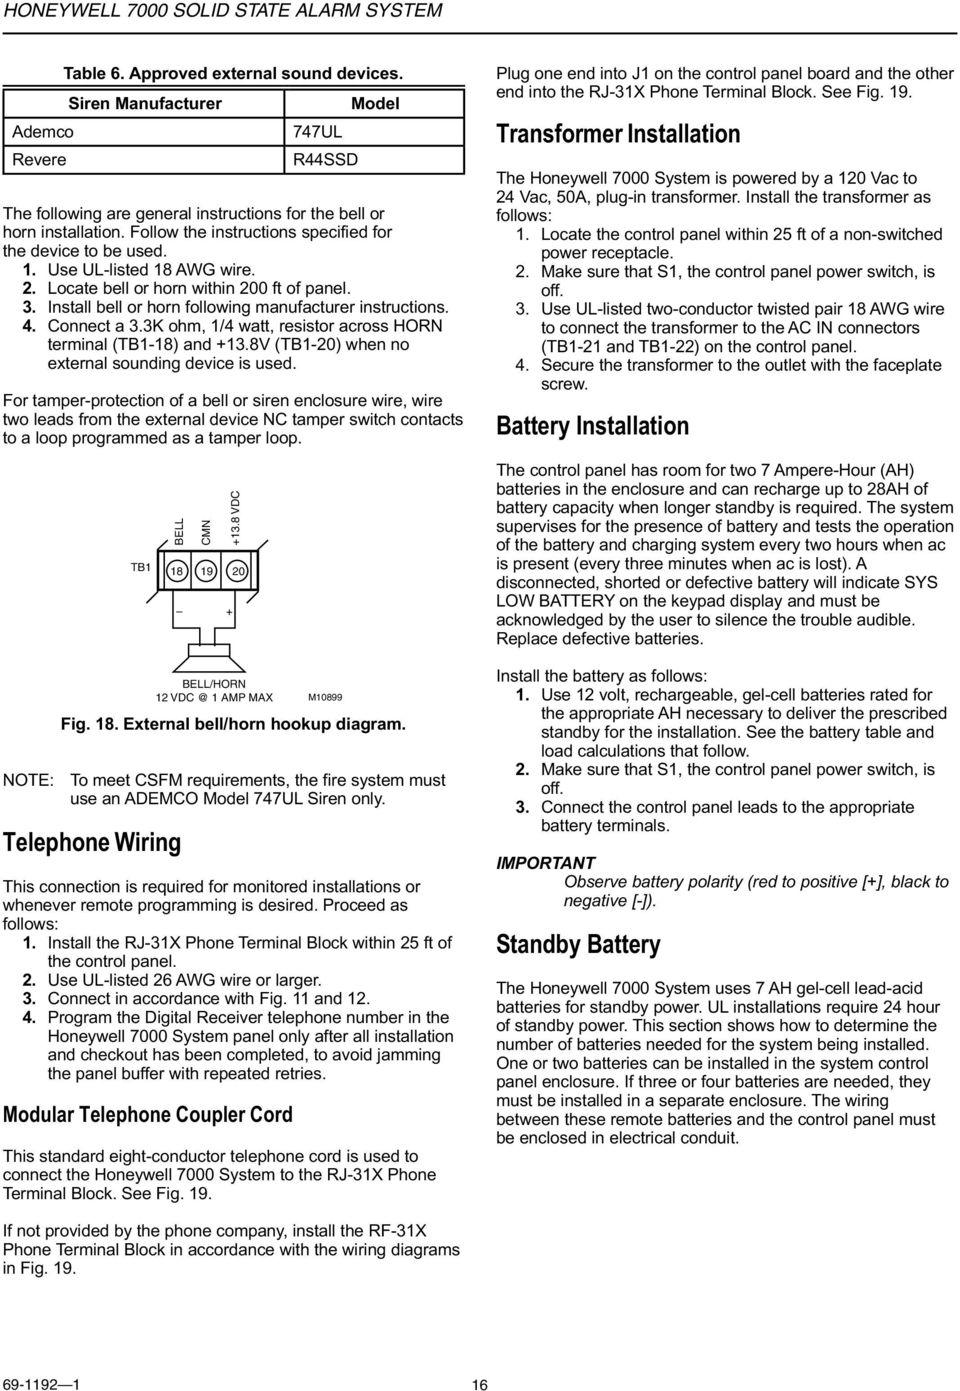 hight resolution of connect a 3 3k ohm 4 watt resistor across horn terminal tb